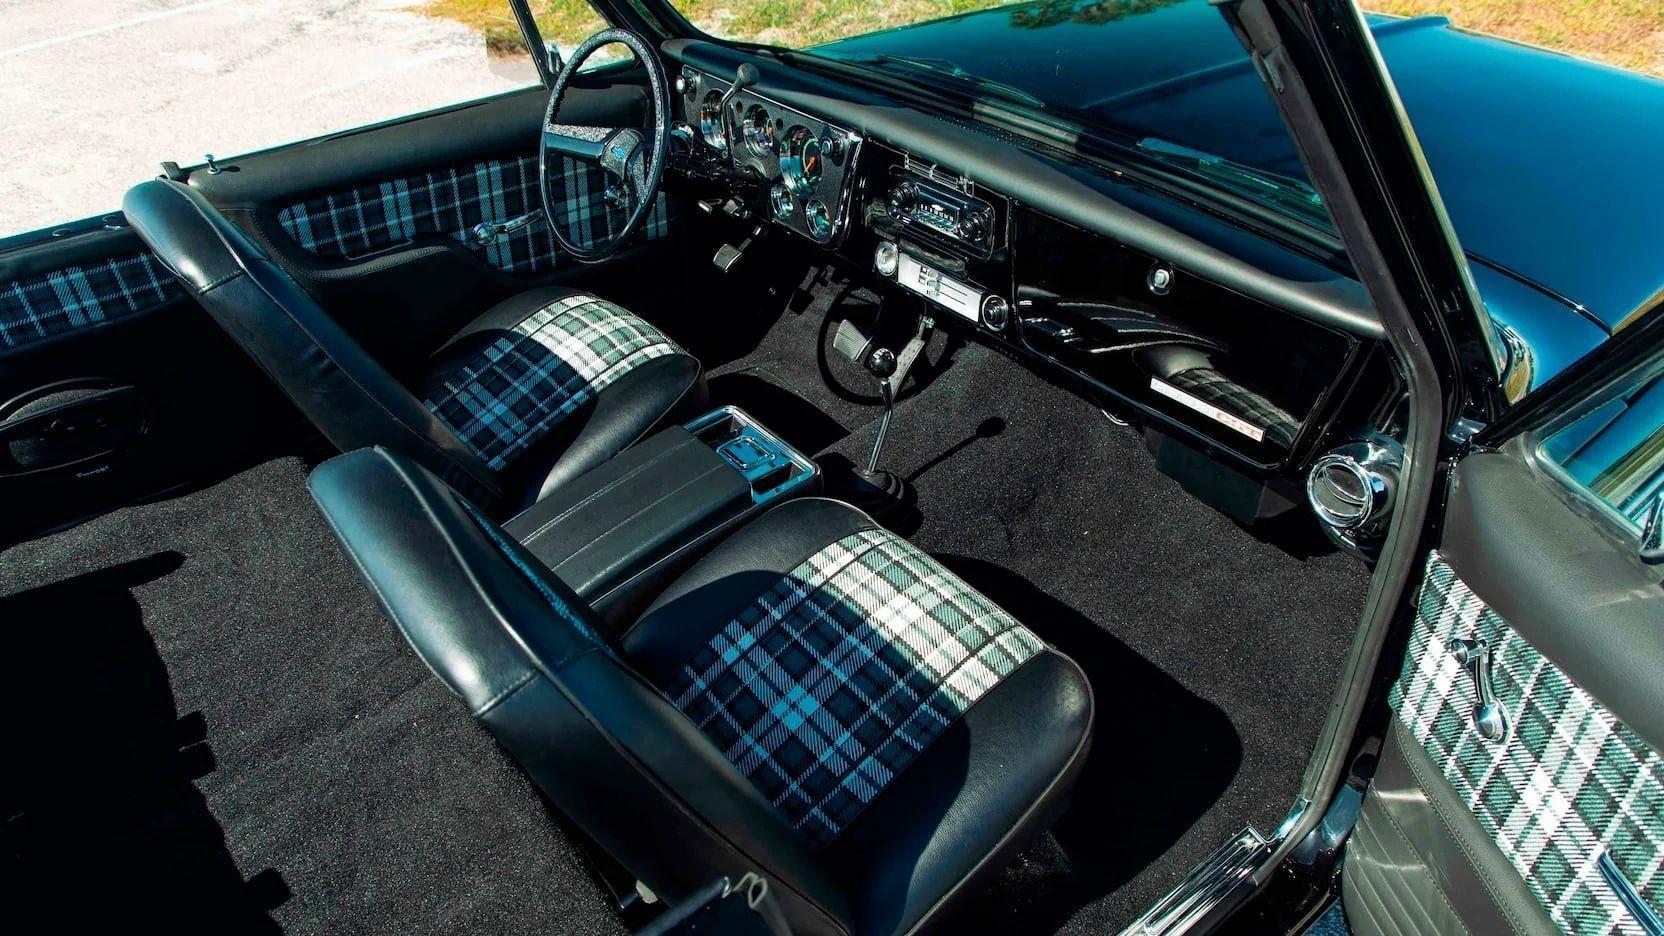 Рестомод Chevrolet K5 Blazer 1972 без крыши